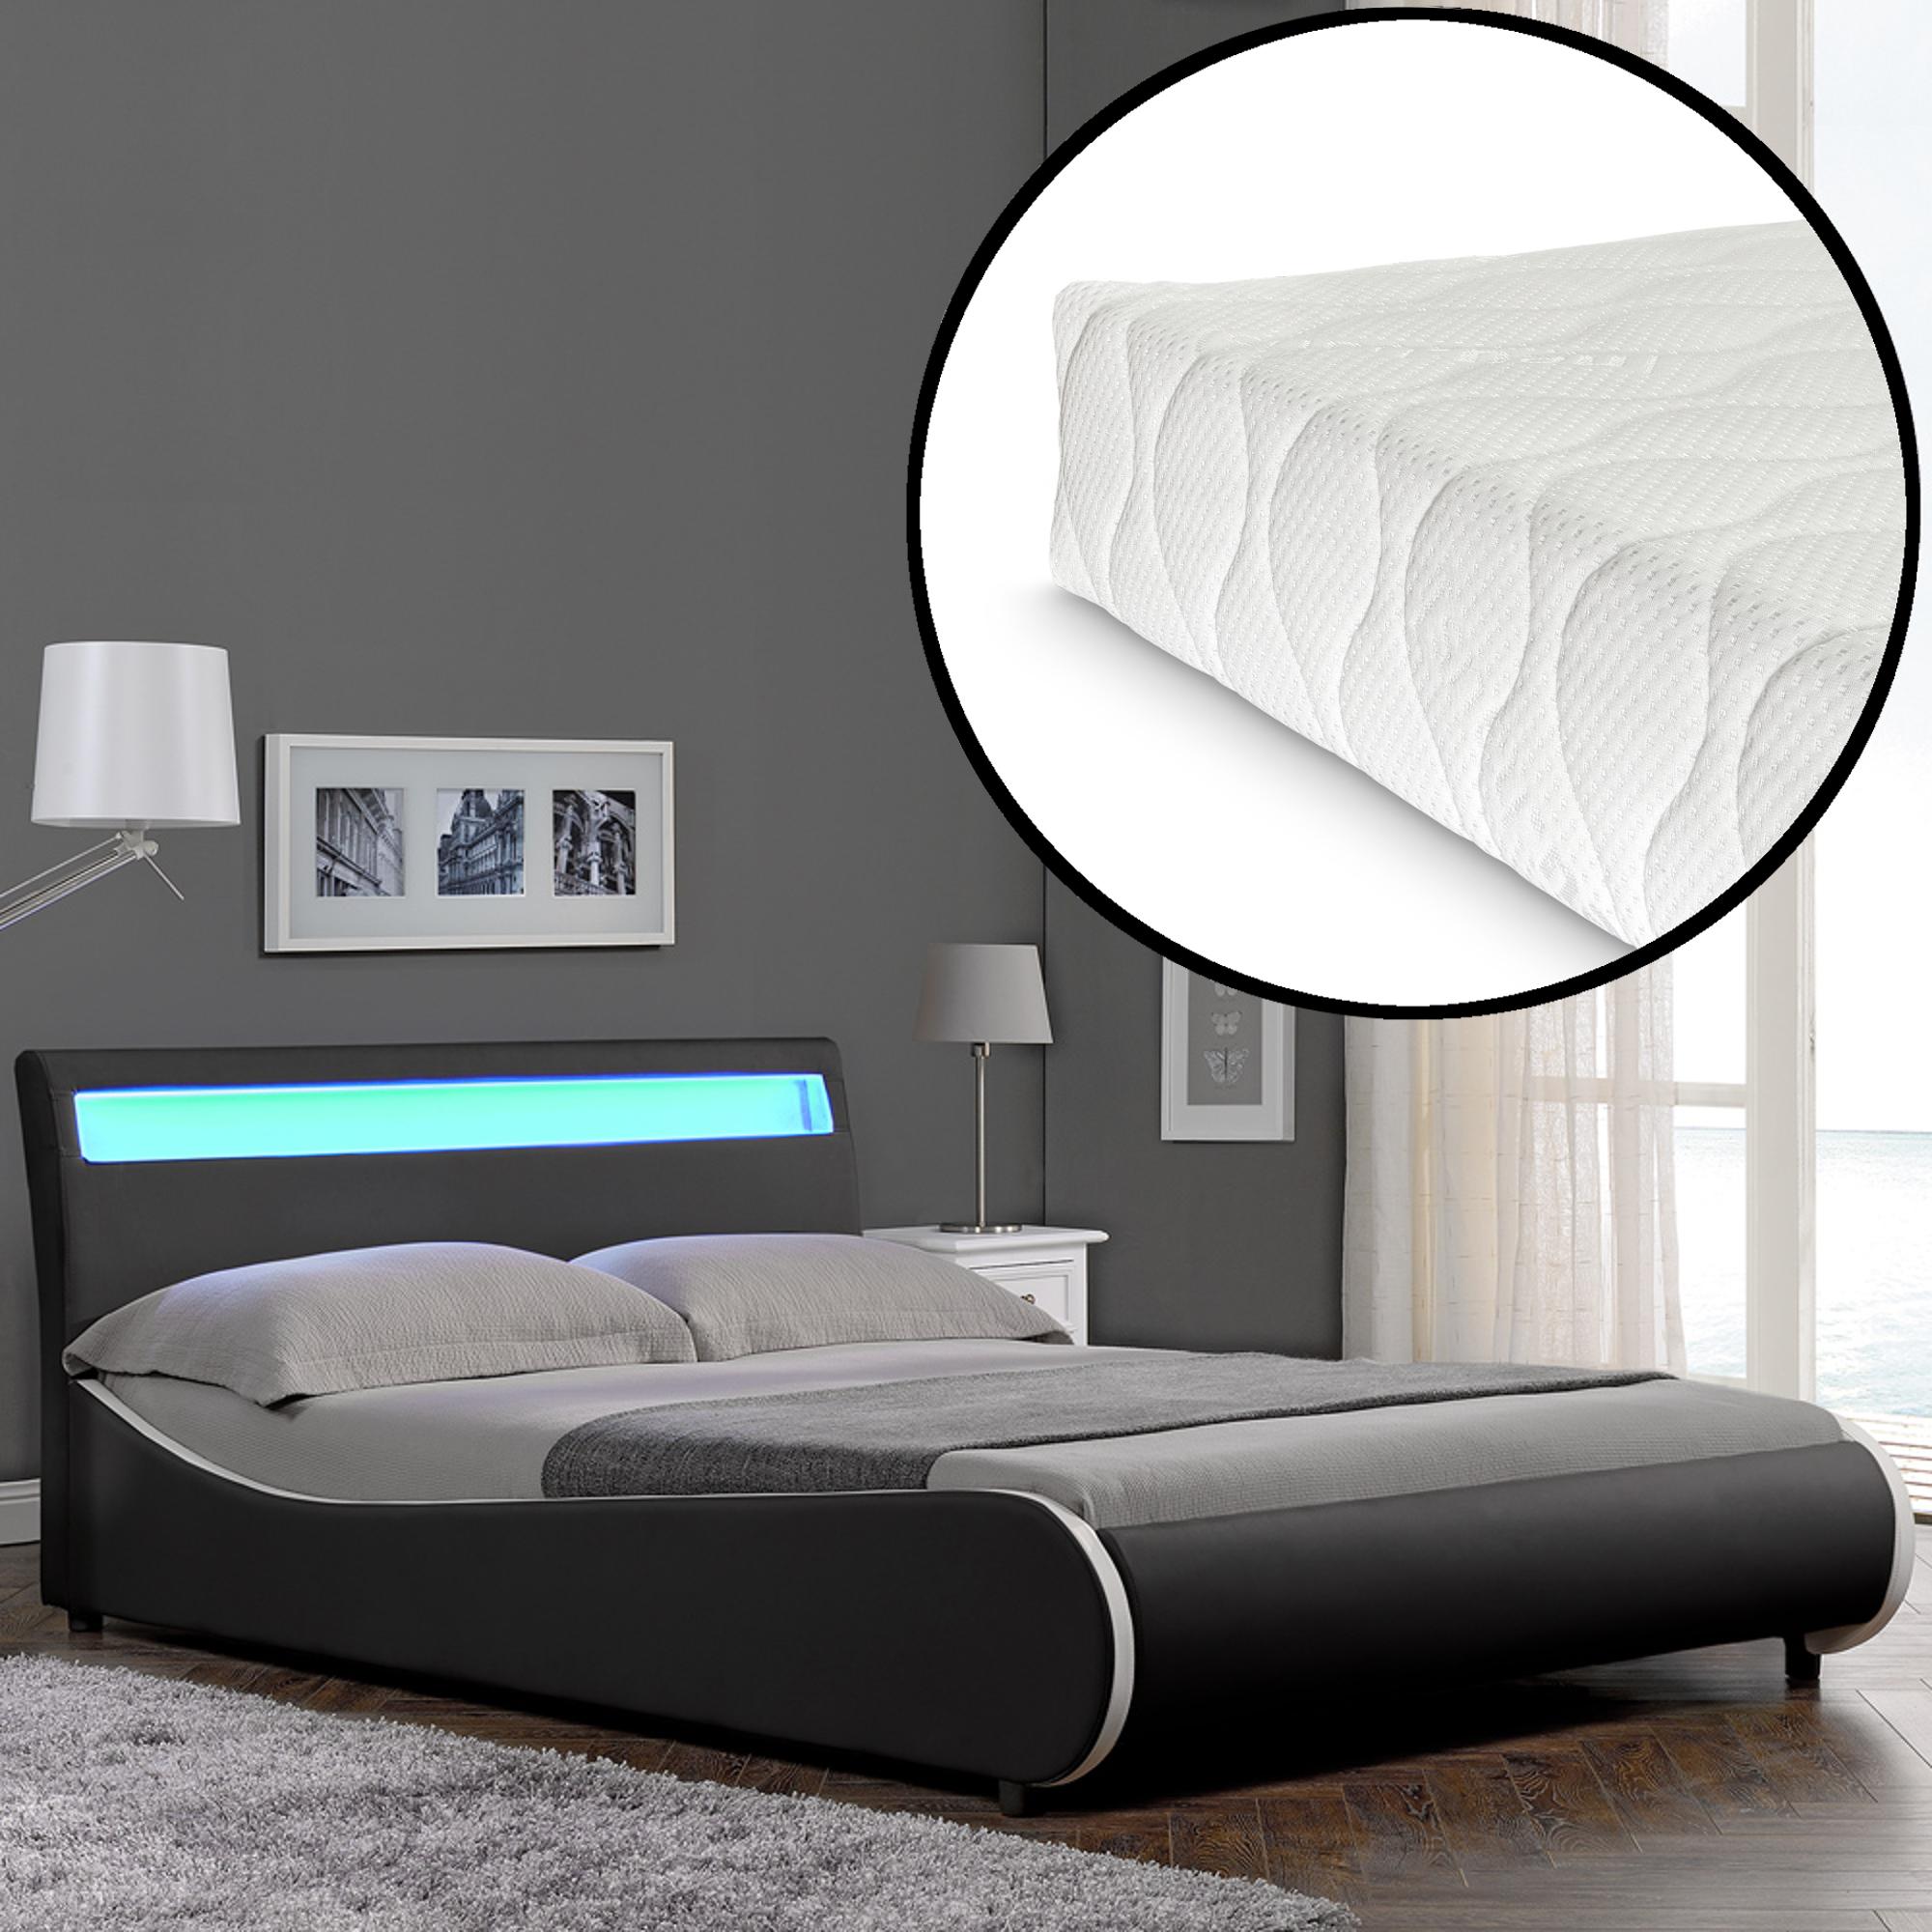 Full Size of Corium Led Modernes Polsterbett Matratze 140x200cm Kunst Leder Schlafzimmer Betten Bett Ohne Füße Joop Bettwäsche Sprüche Stabiles Rausfallschutz Bett Modernes Bett